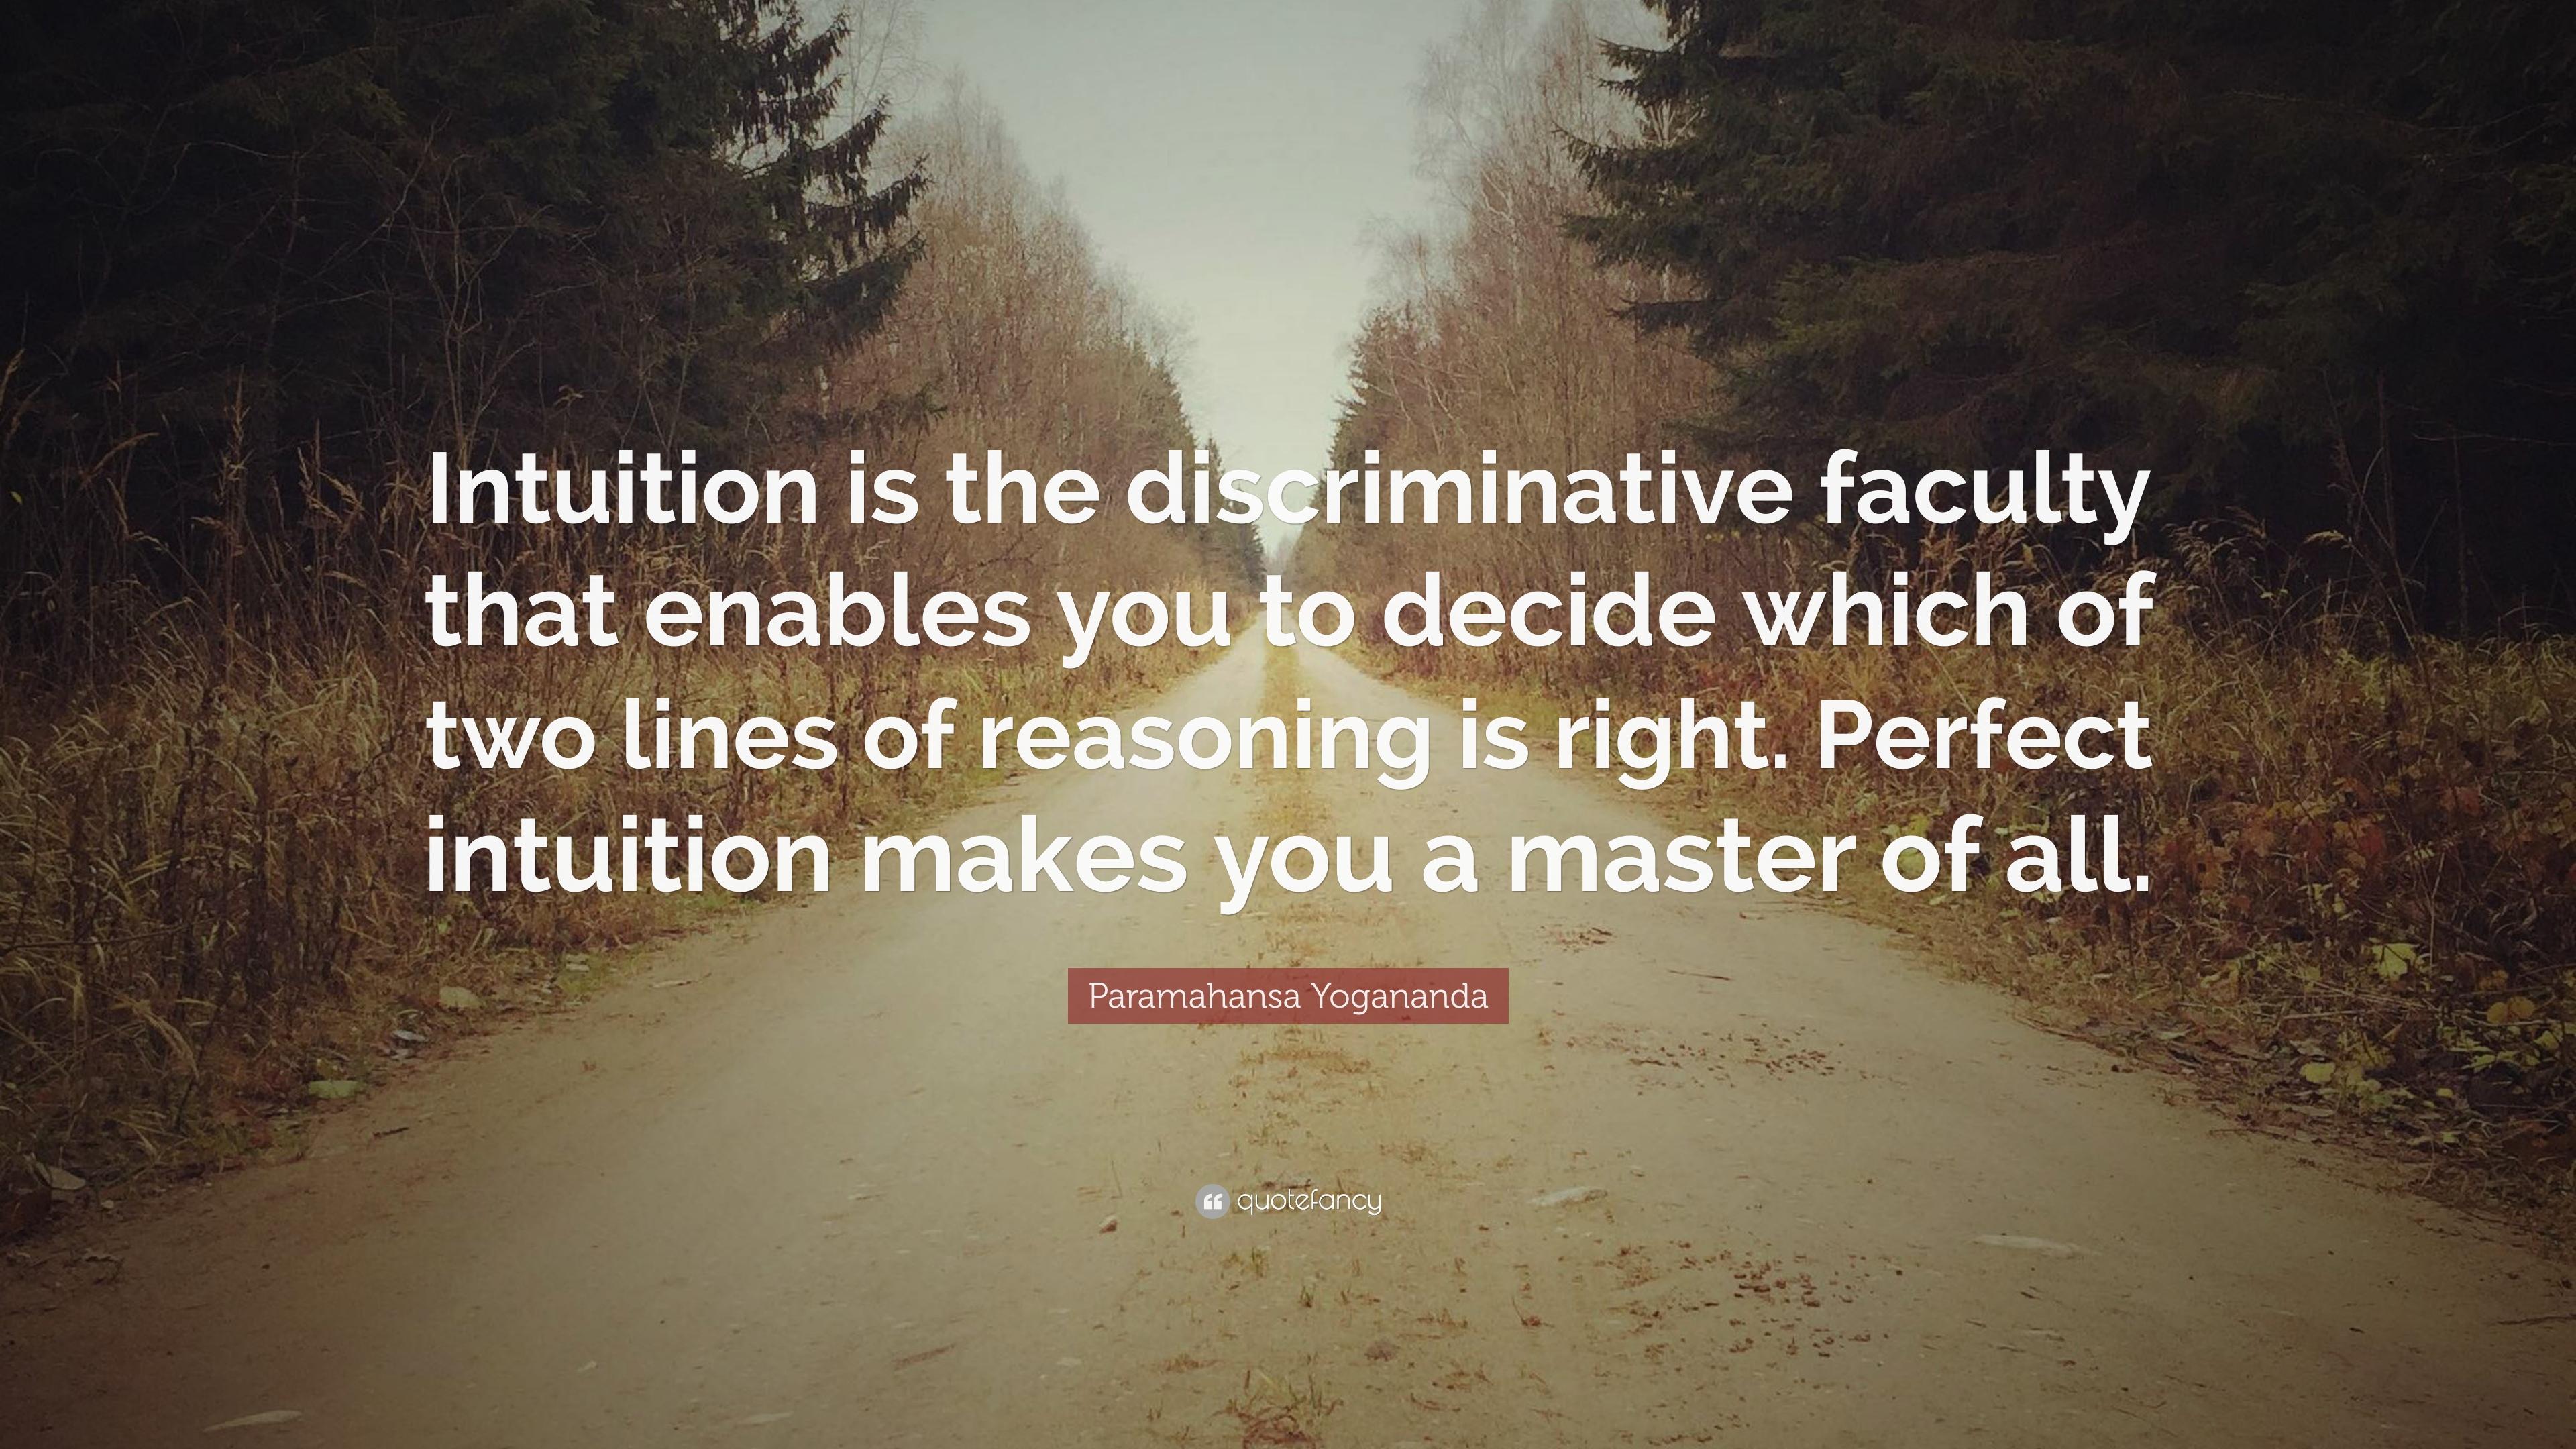 64555-Paramahansa-Yogananda-Quote-Intuition-is-the-discriminative.jpg